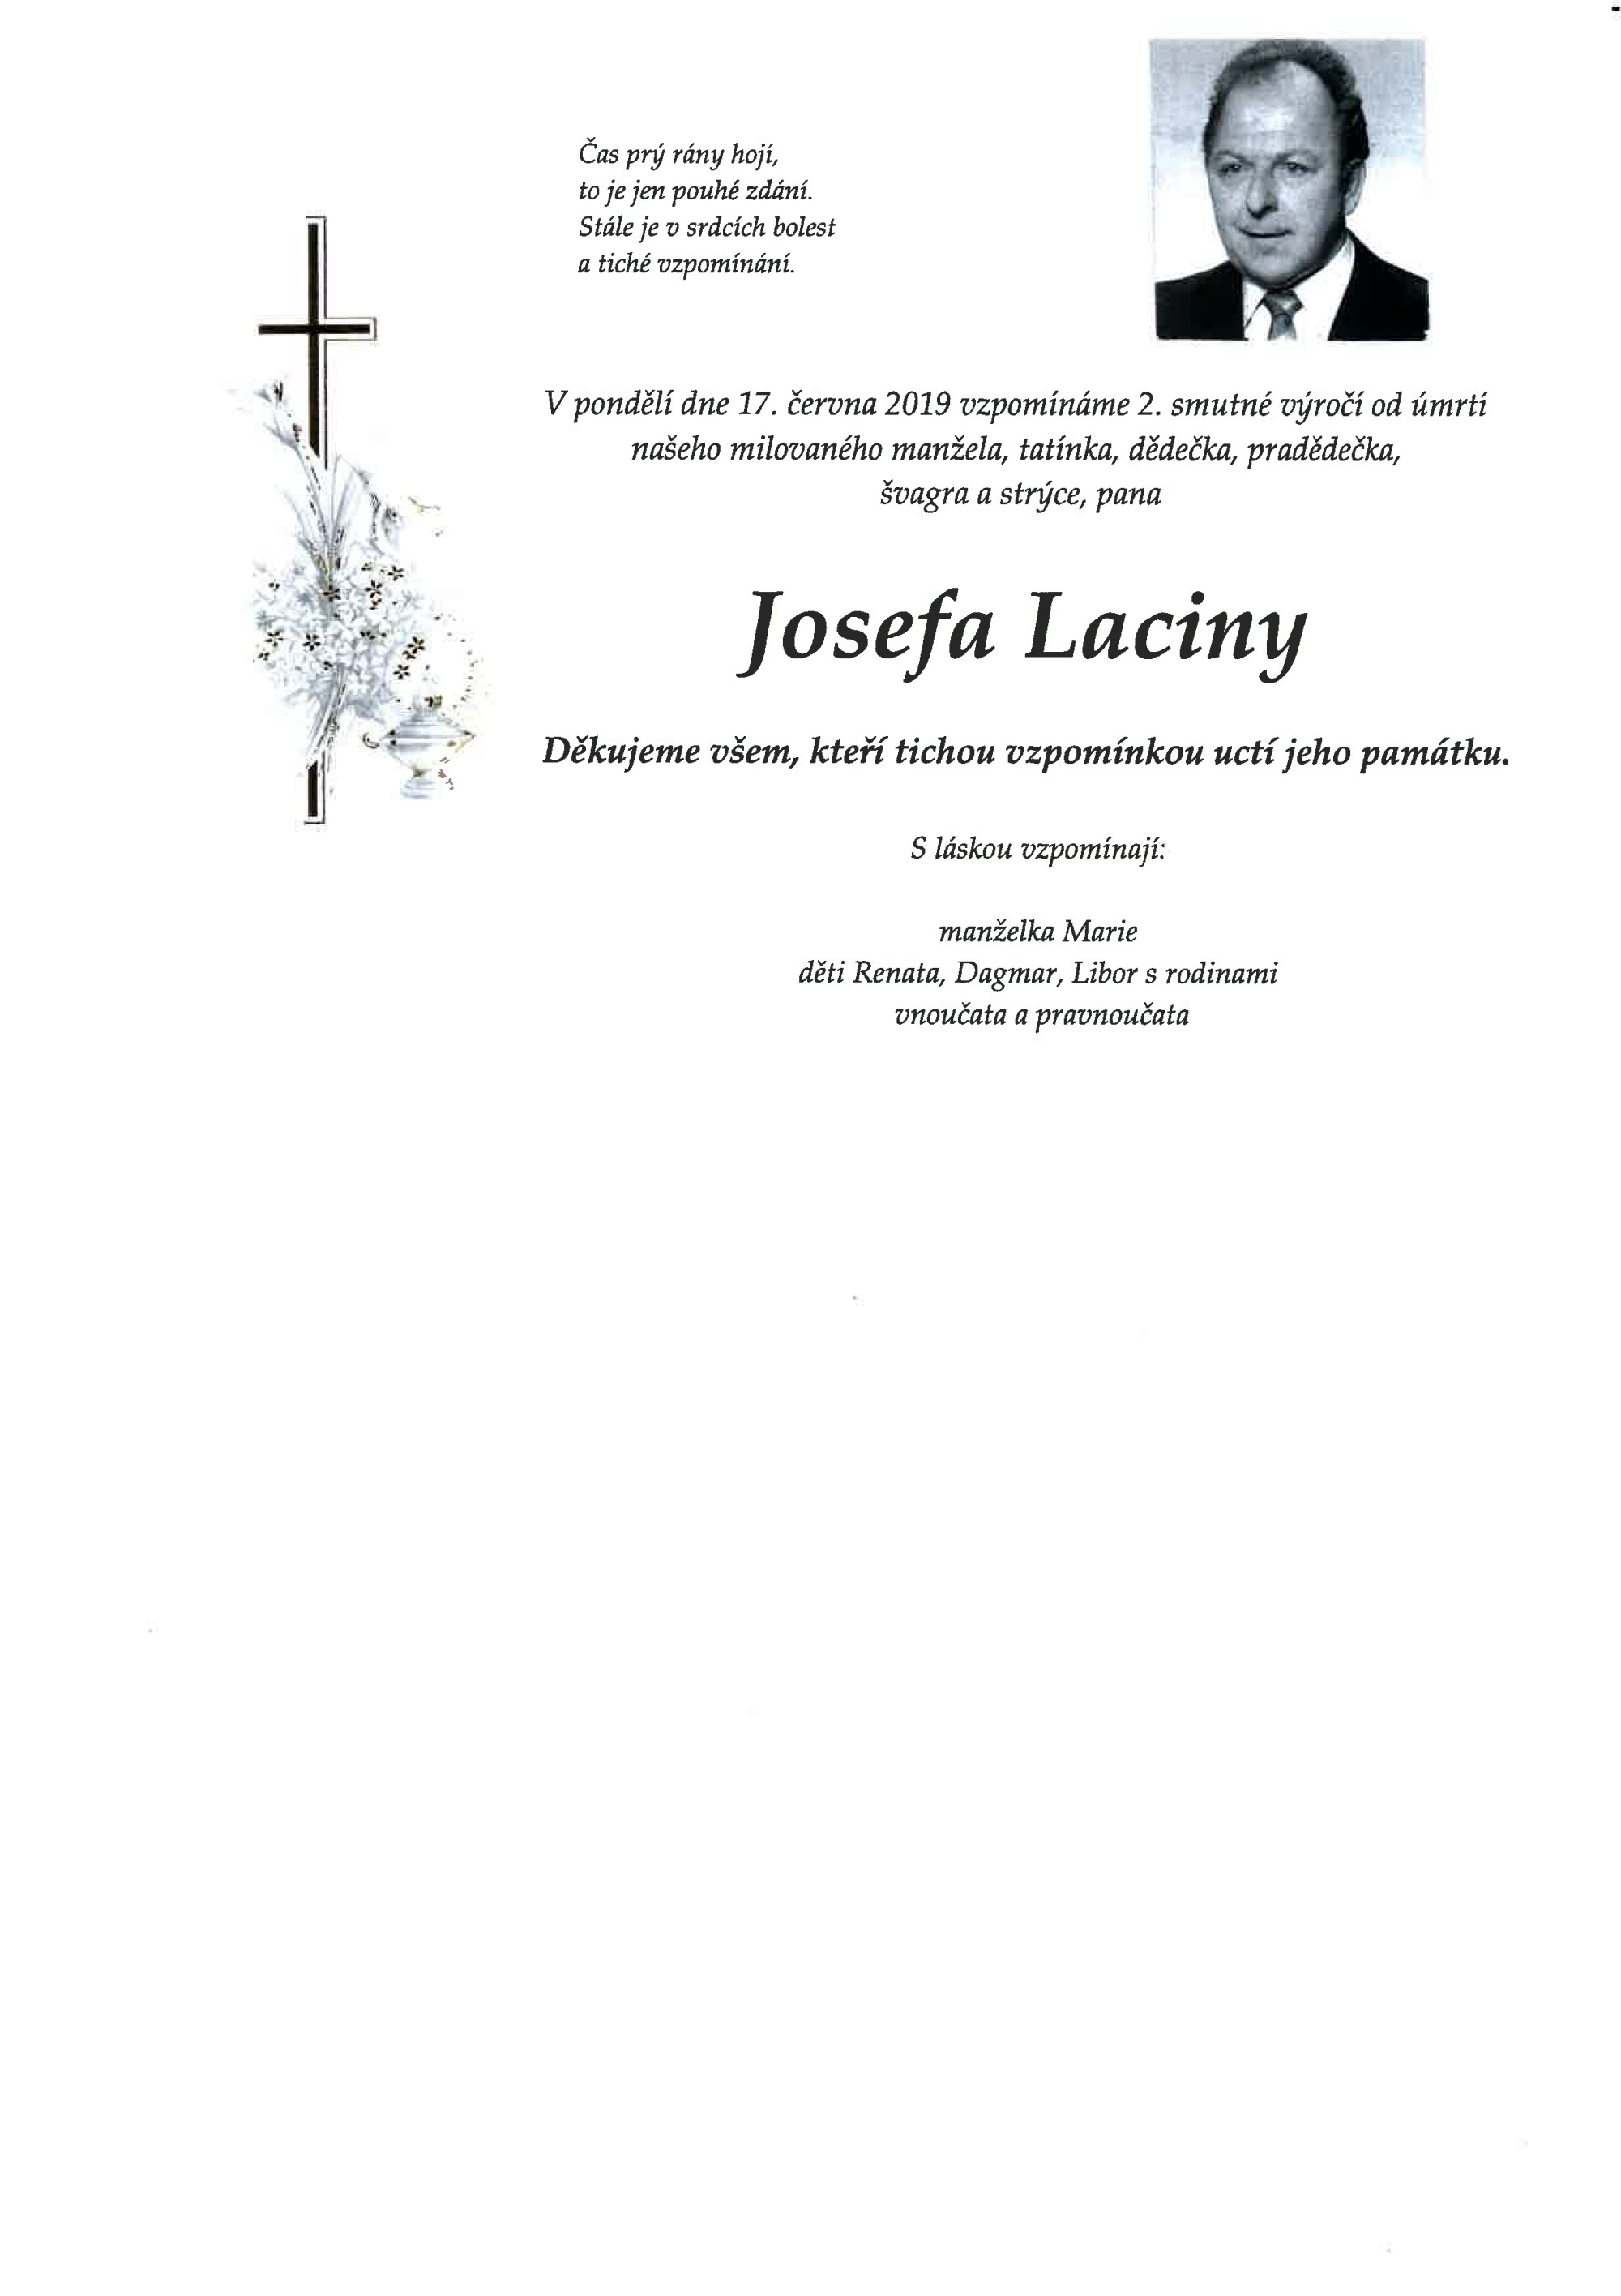 Josef Lacina